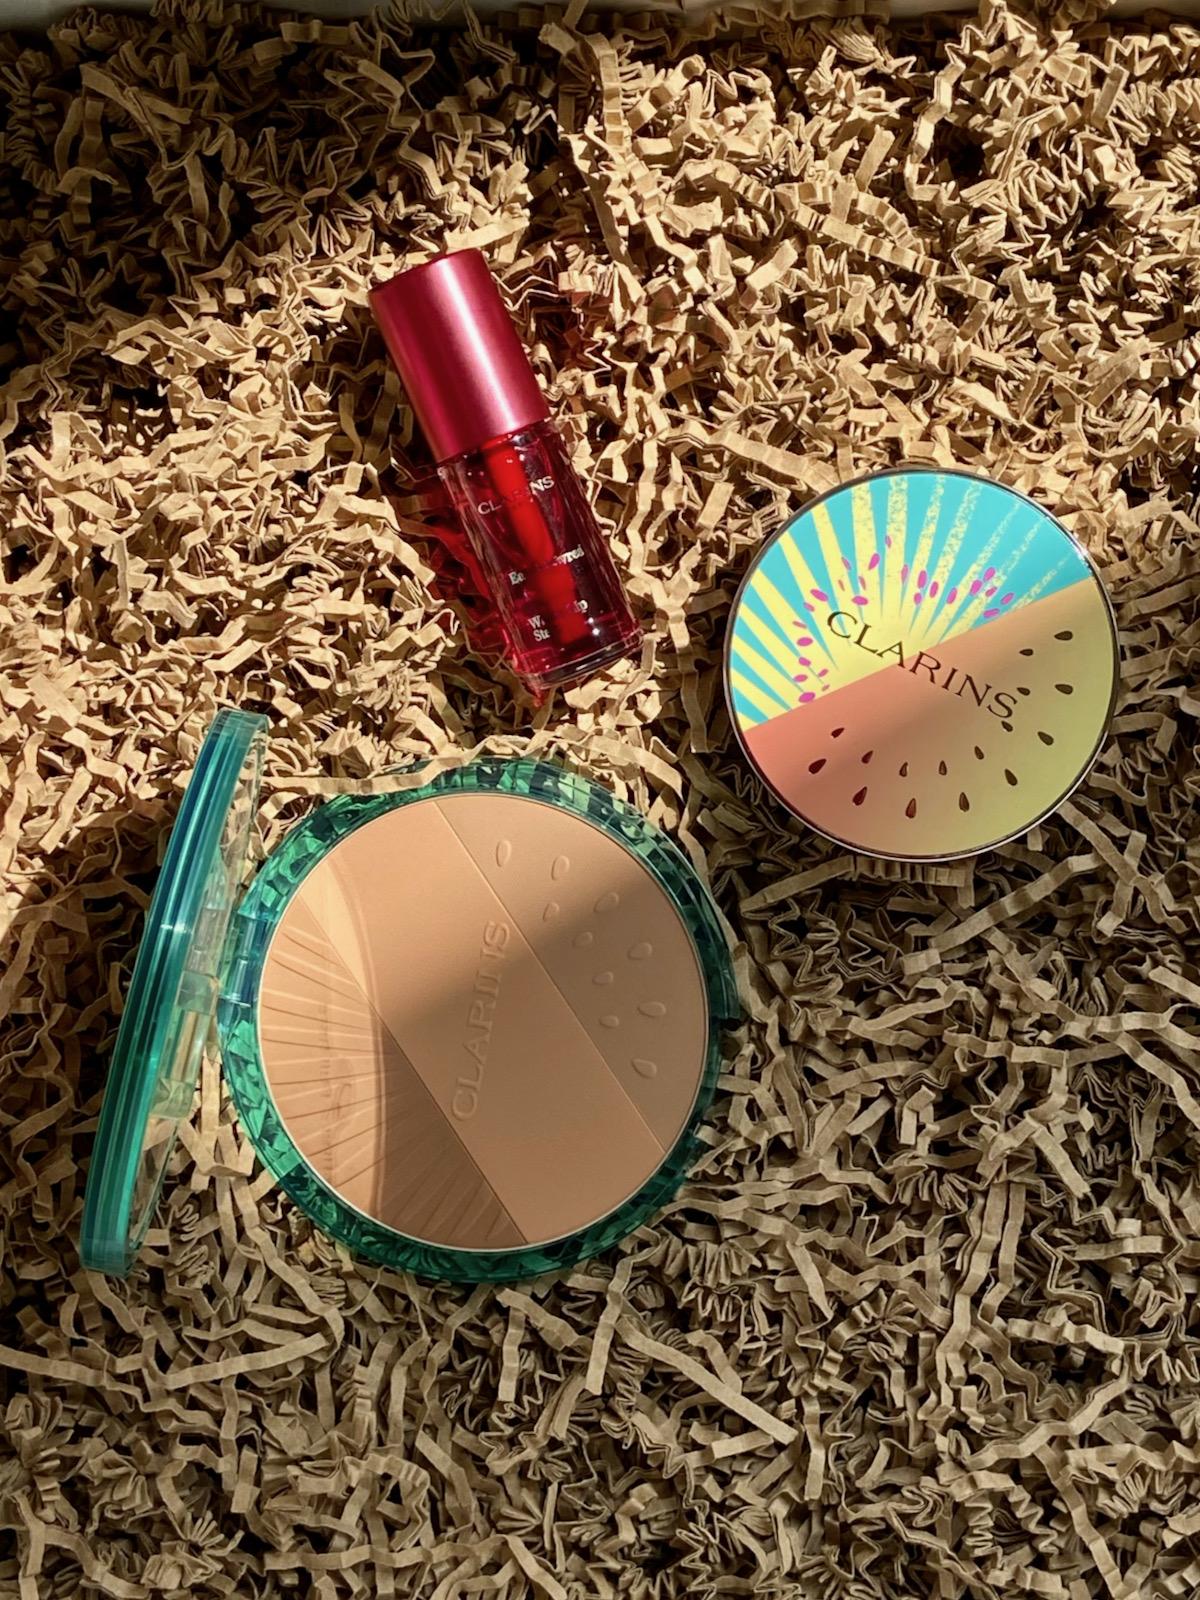 Clarins Sommerlook 2021 Frozen Summer Bronzer Compact Ombre 4 Couleurs Golden Hour Gradation Water Lip Stain 09 deep red water